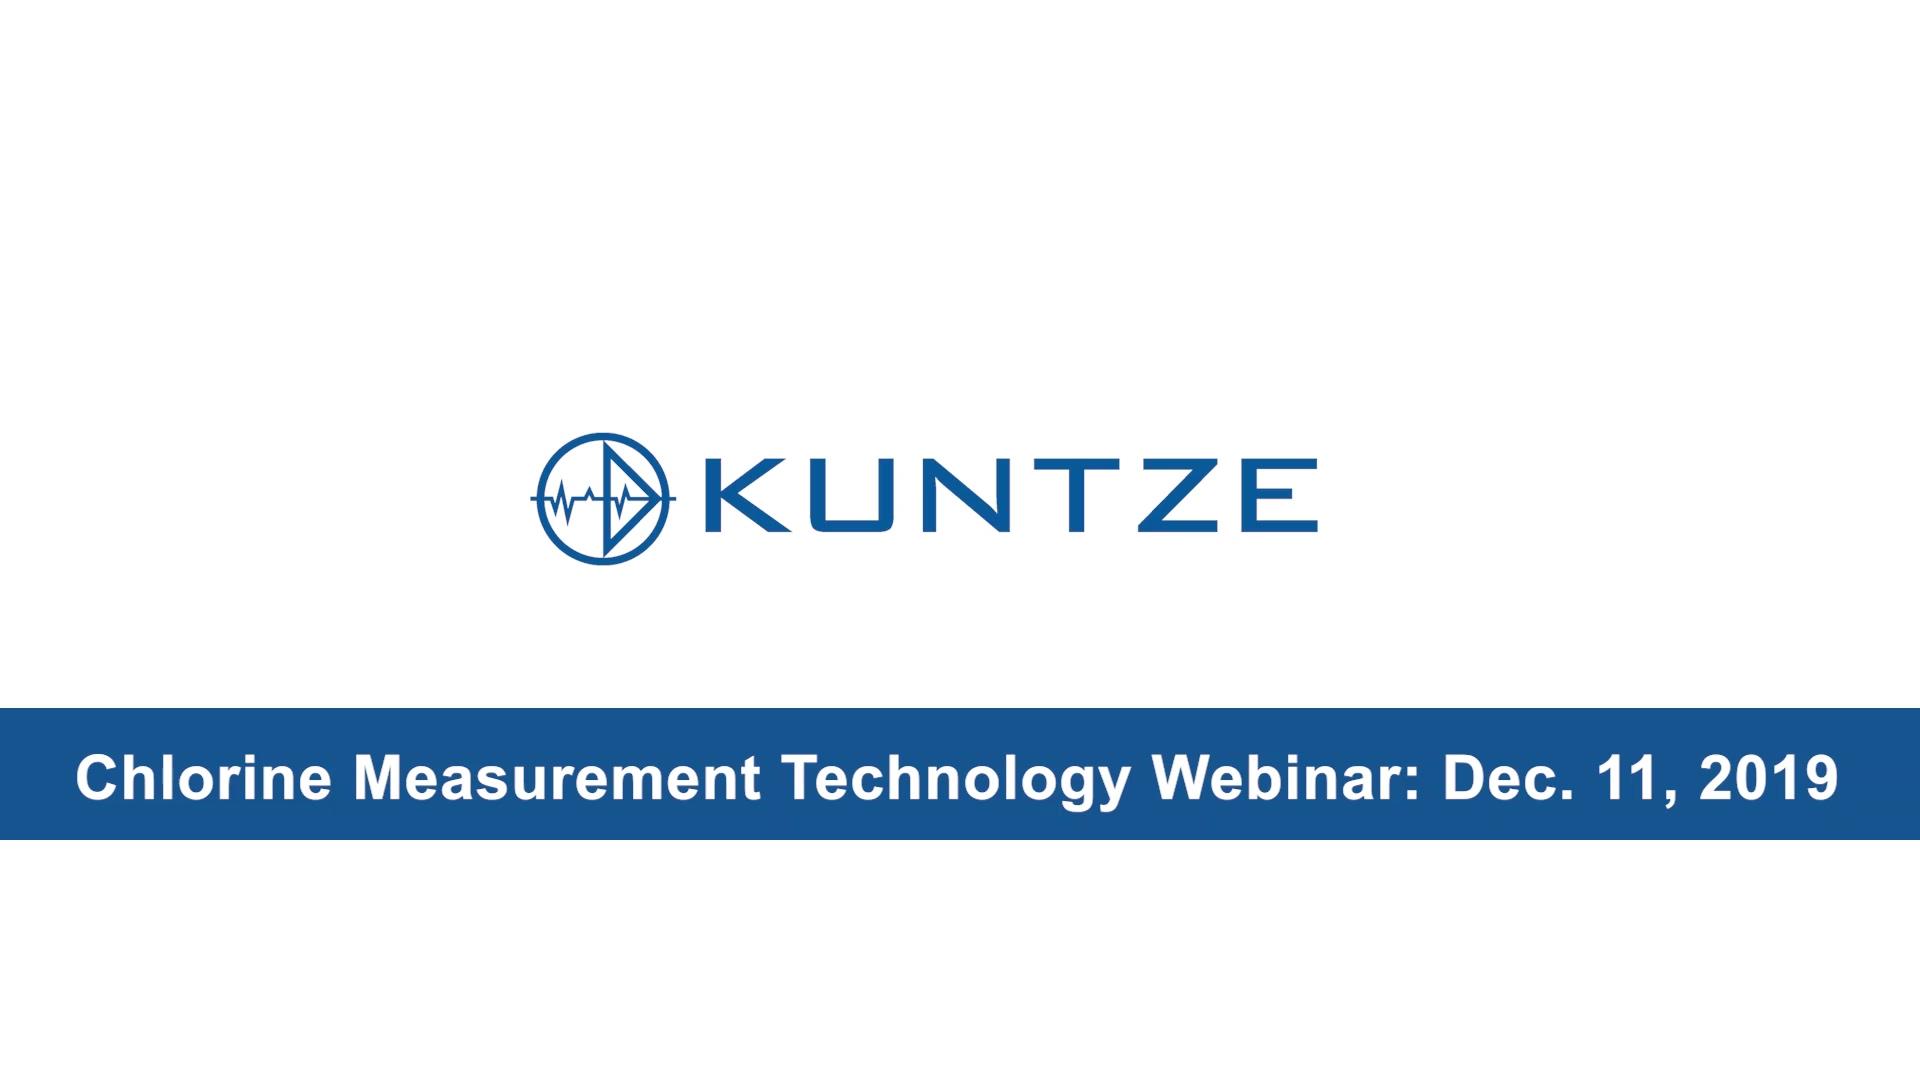 Kunze Product Intro Webinar 12-11-19